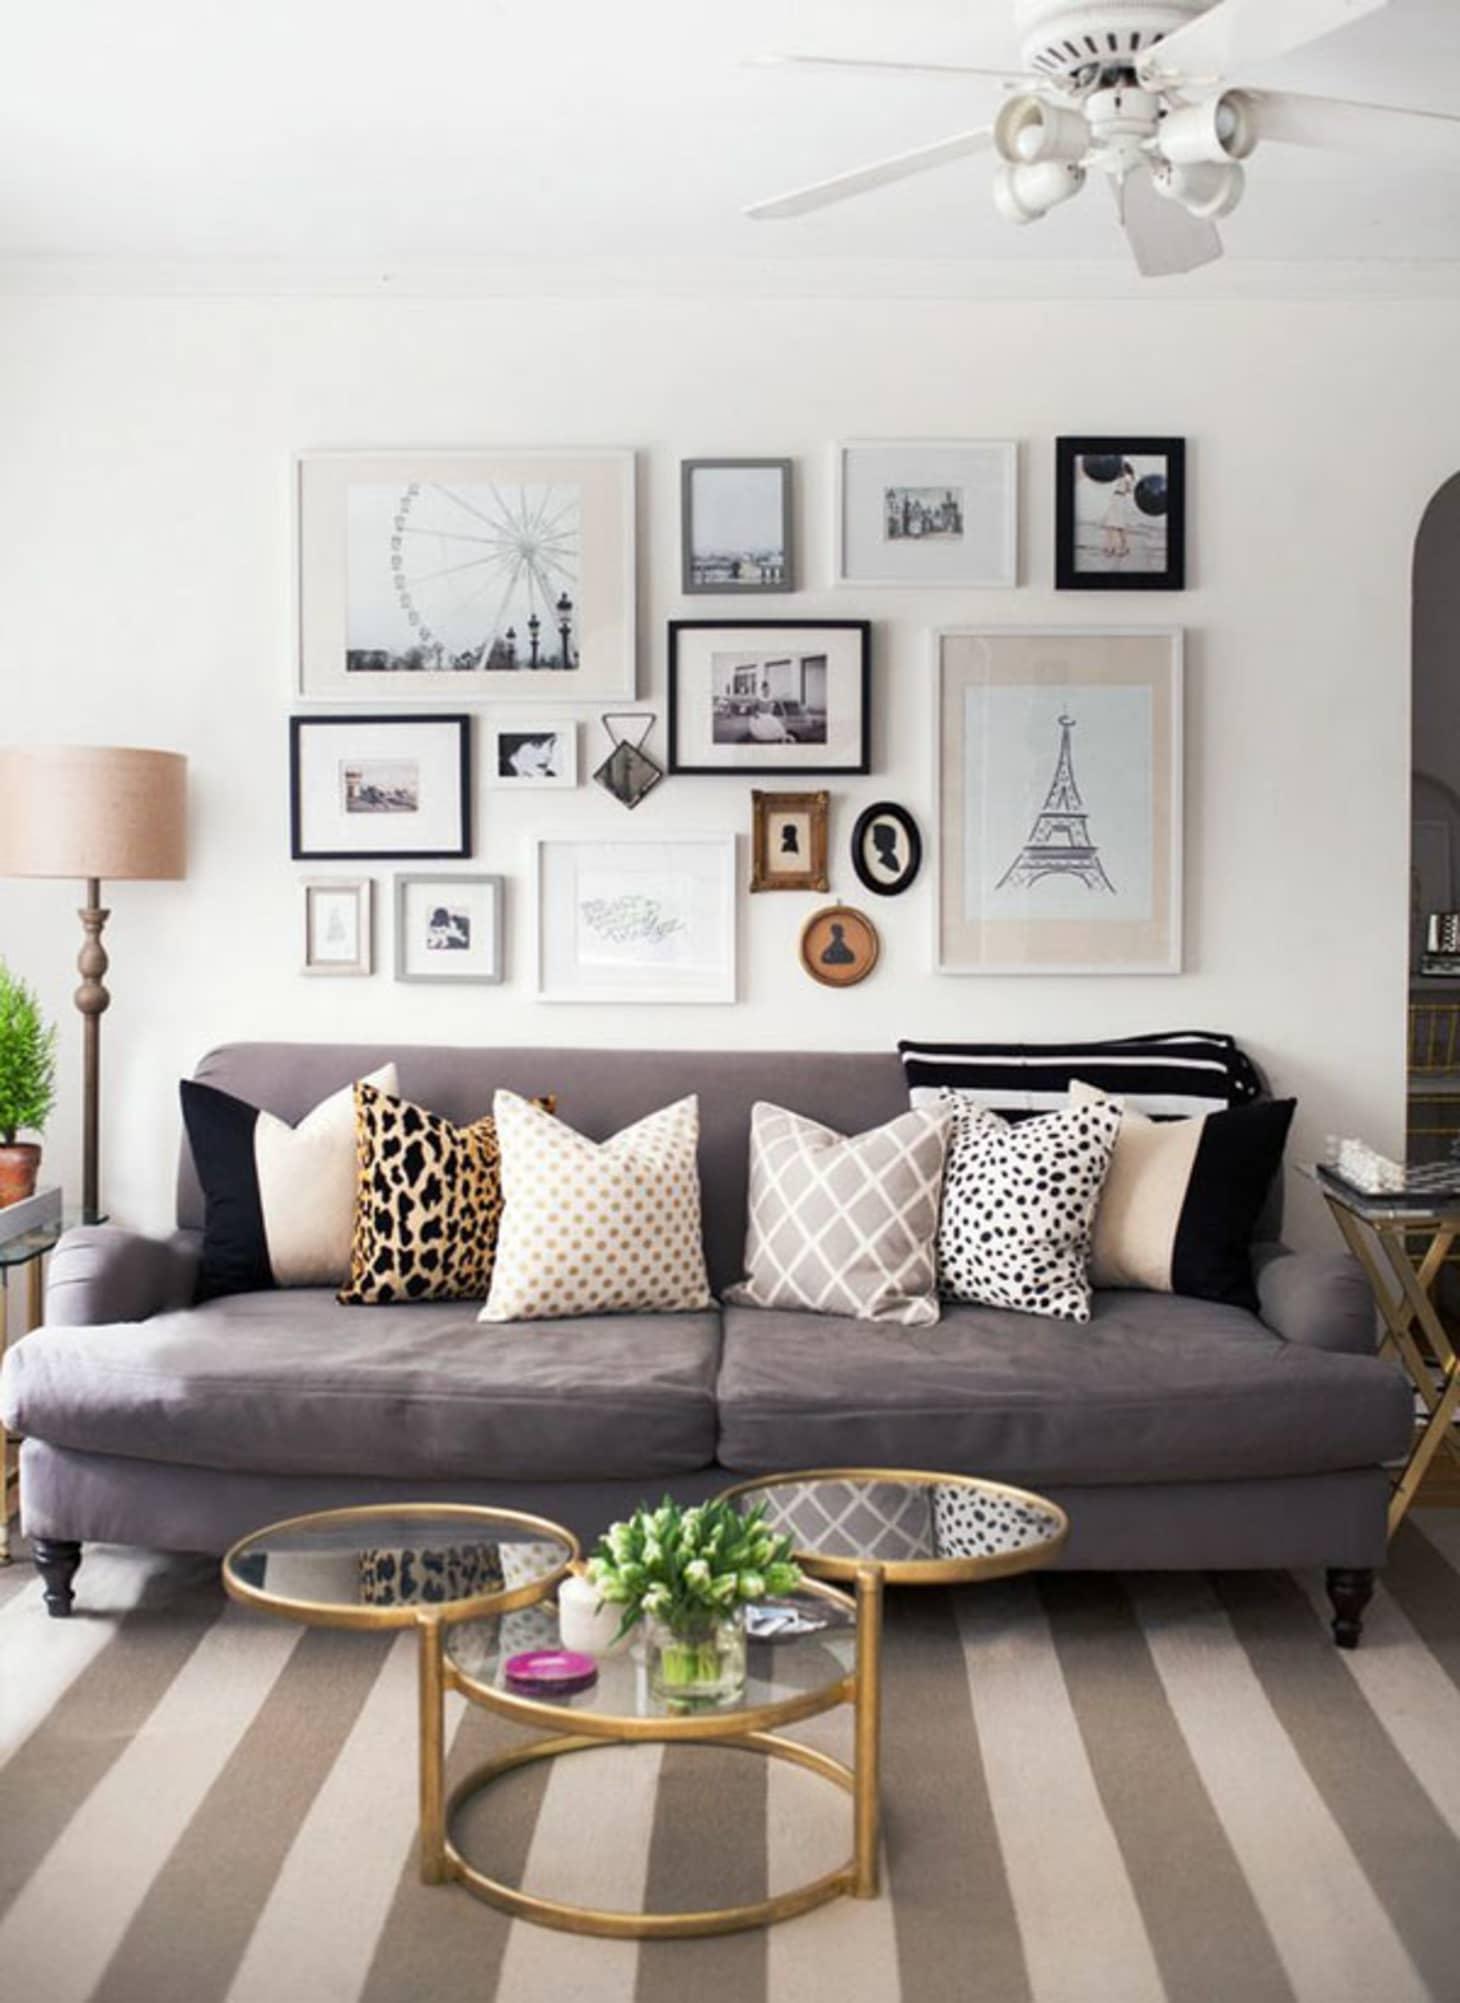 Cheetah Print Decorative Pillows 3